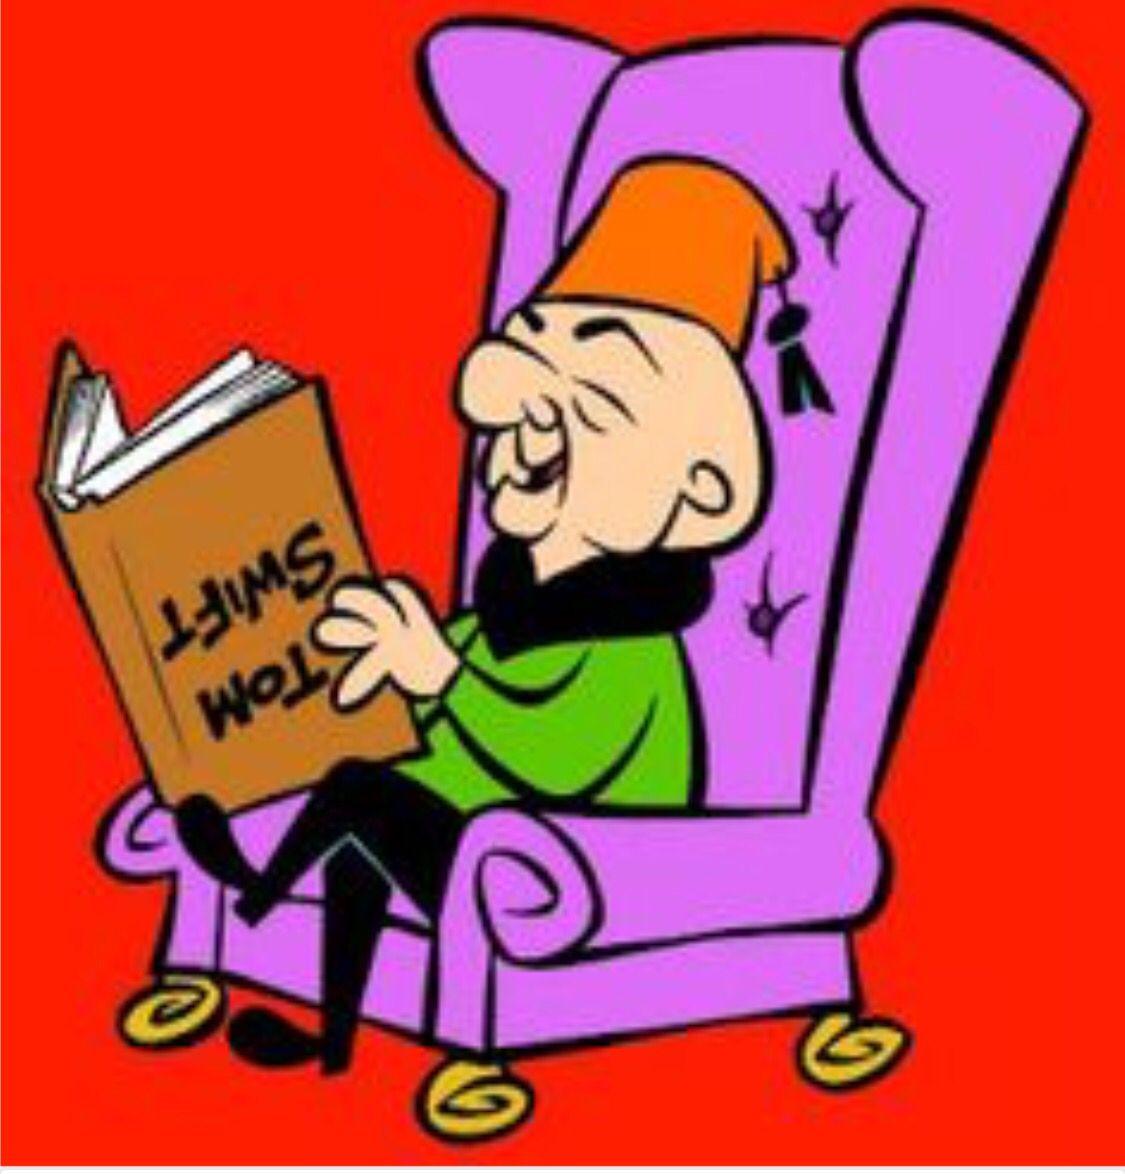 Mr Clipart Mr Magoo - Mr Magoo Shakes - Png Download (#5740486) - PinClipart